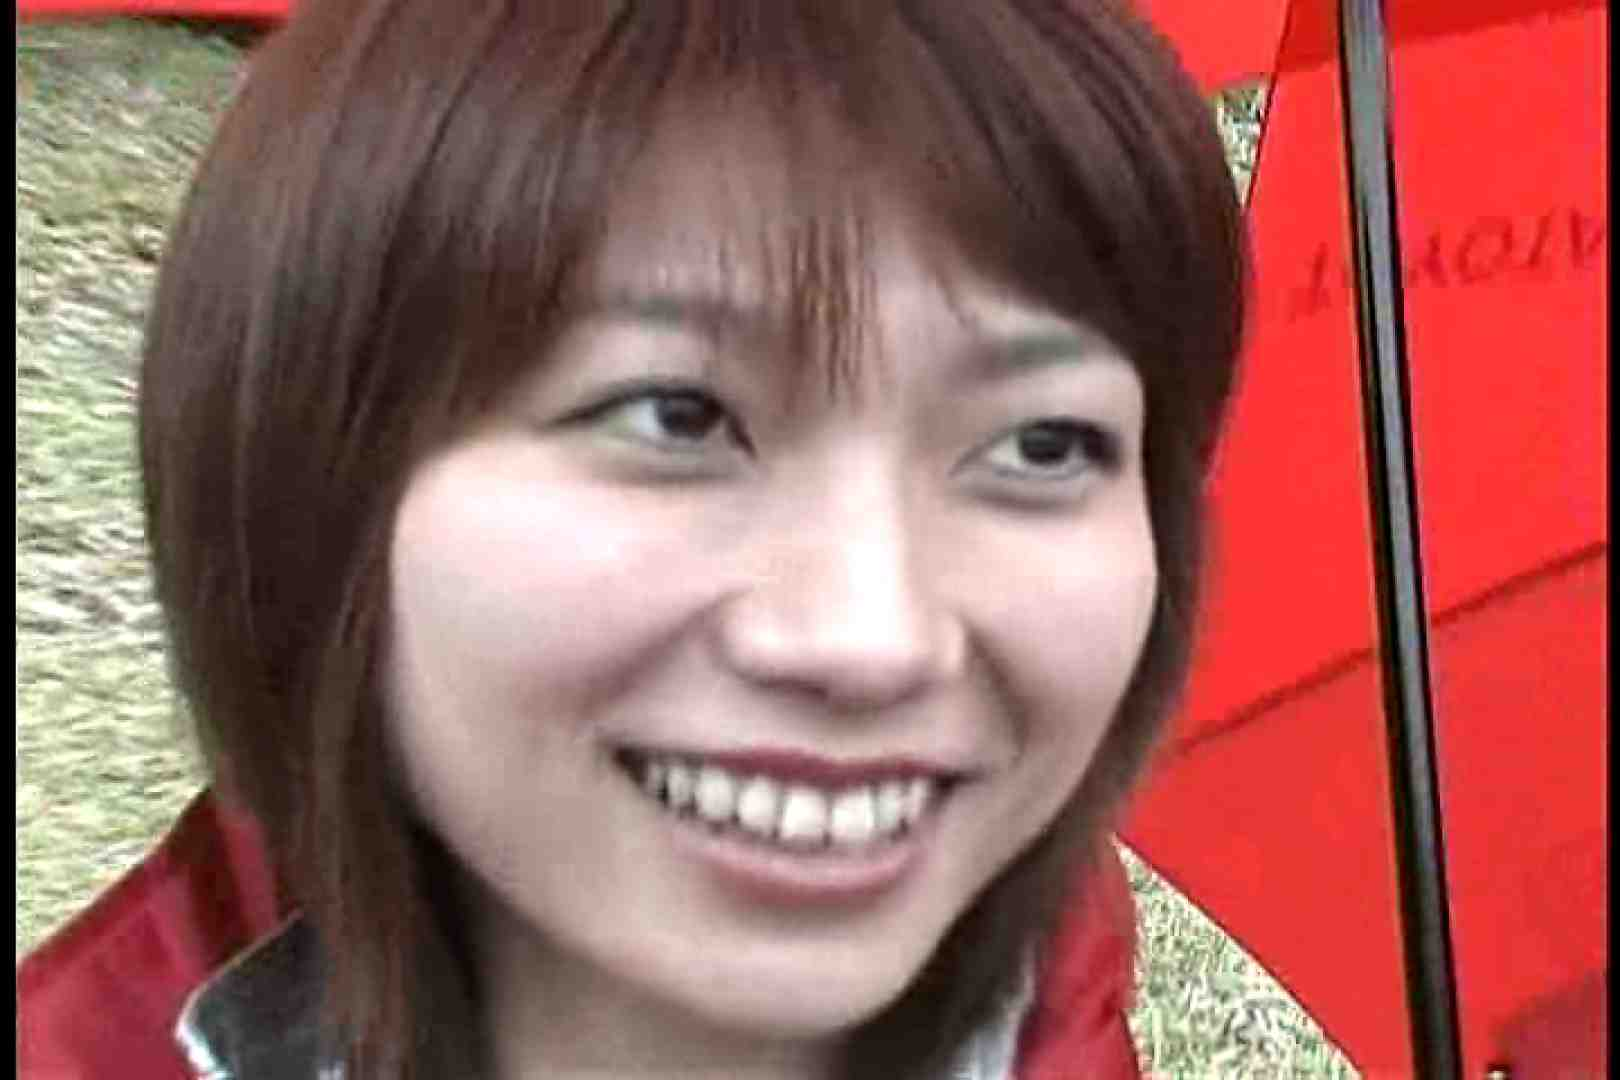 RQカメラ地獄Vol.3 美女OL  83連発 14